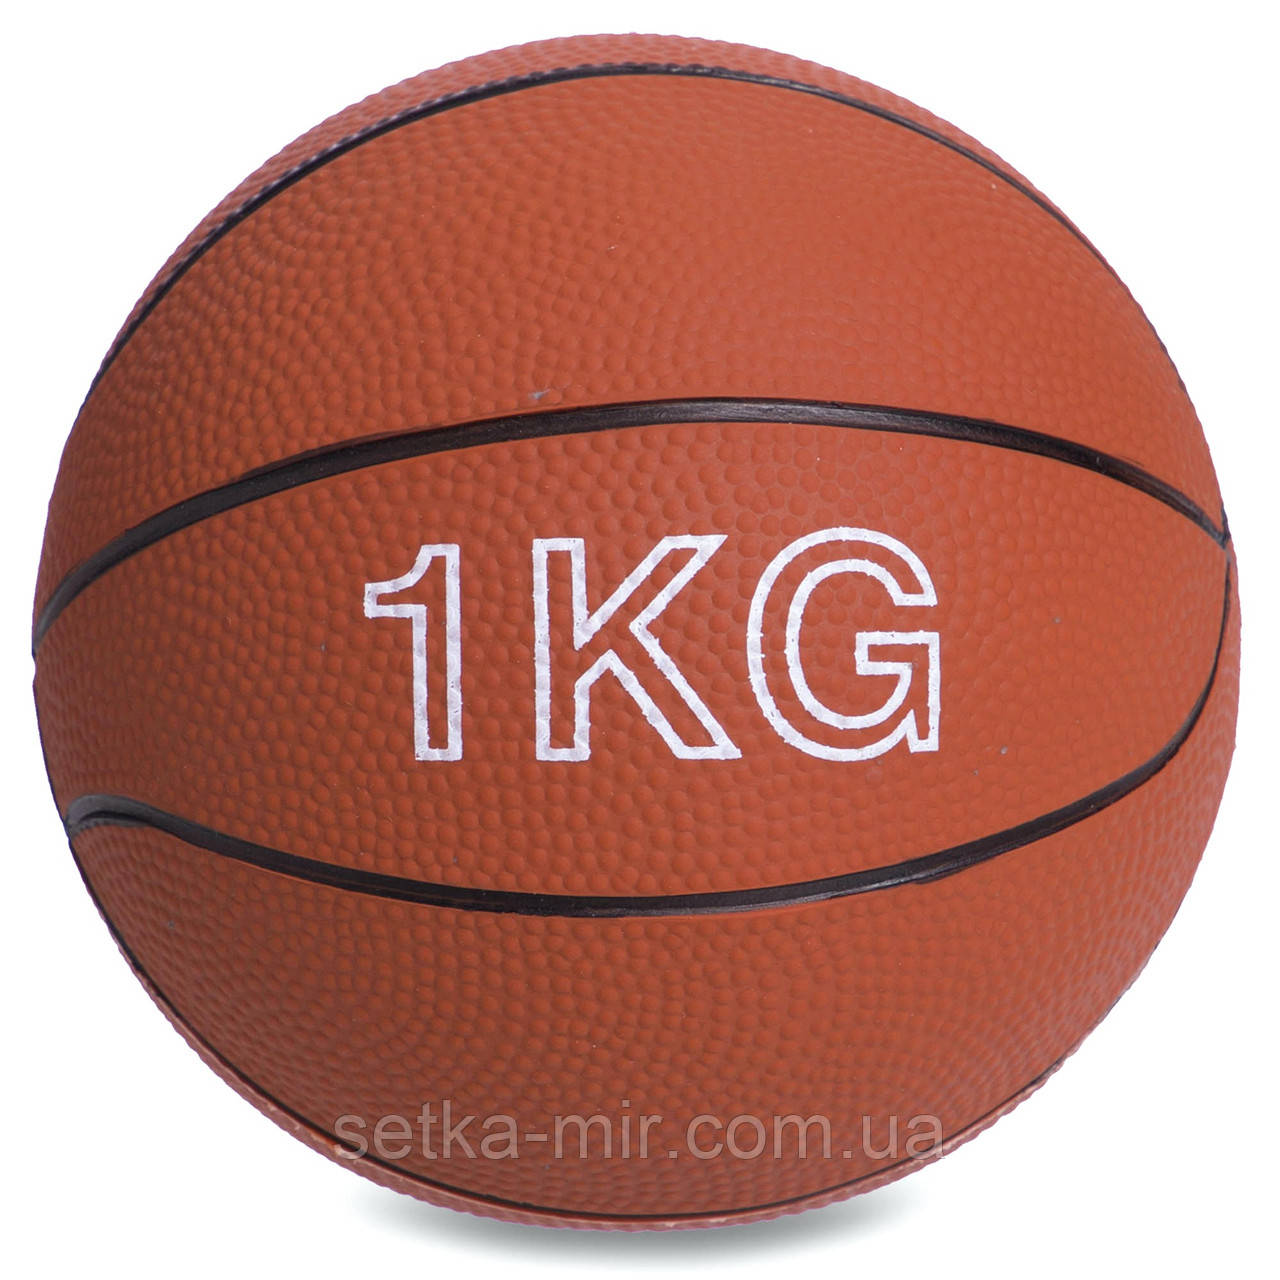 М'яч медичний медбол Record Medicine Ball SC-8407-1 1кг